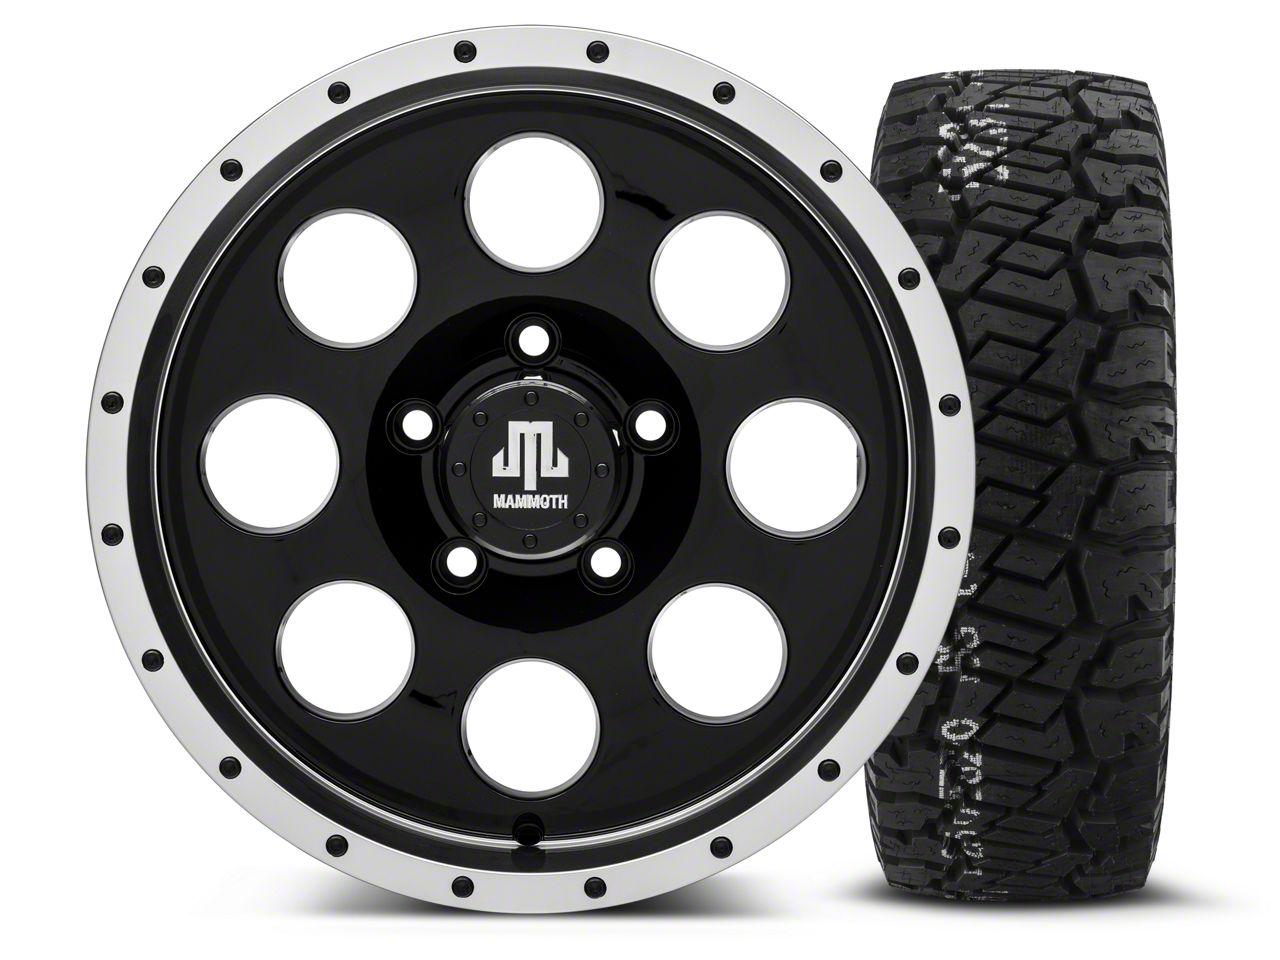 Mammoth 8 Beadlock Style Black - 16x8 Wheel - and BF Goodrich All Terrain TA KO2 Tire - 315/75R16 (07-18 Jeep Wrangler JK)